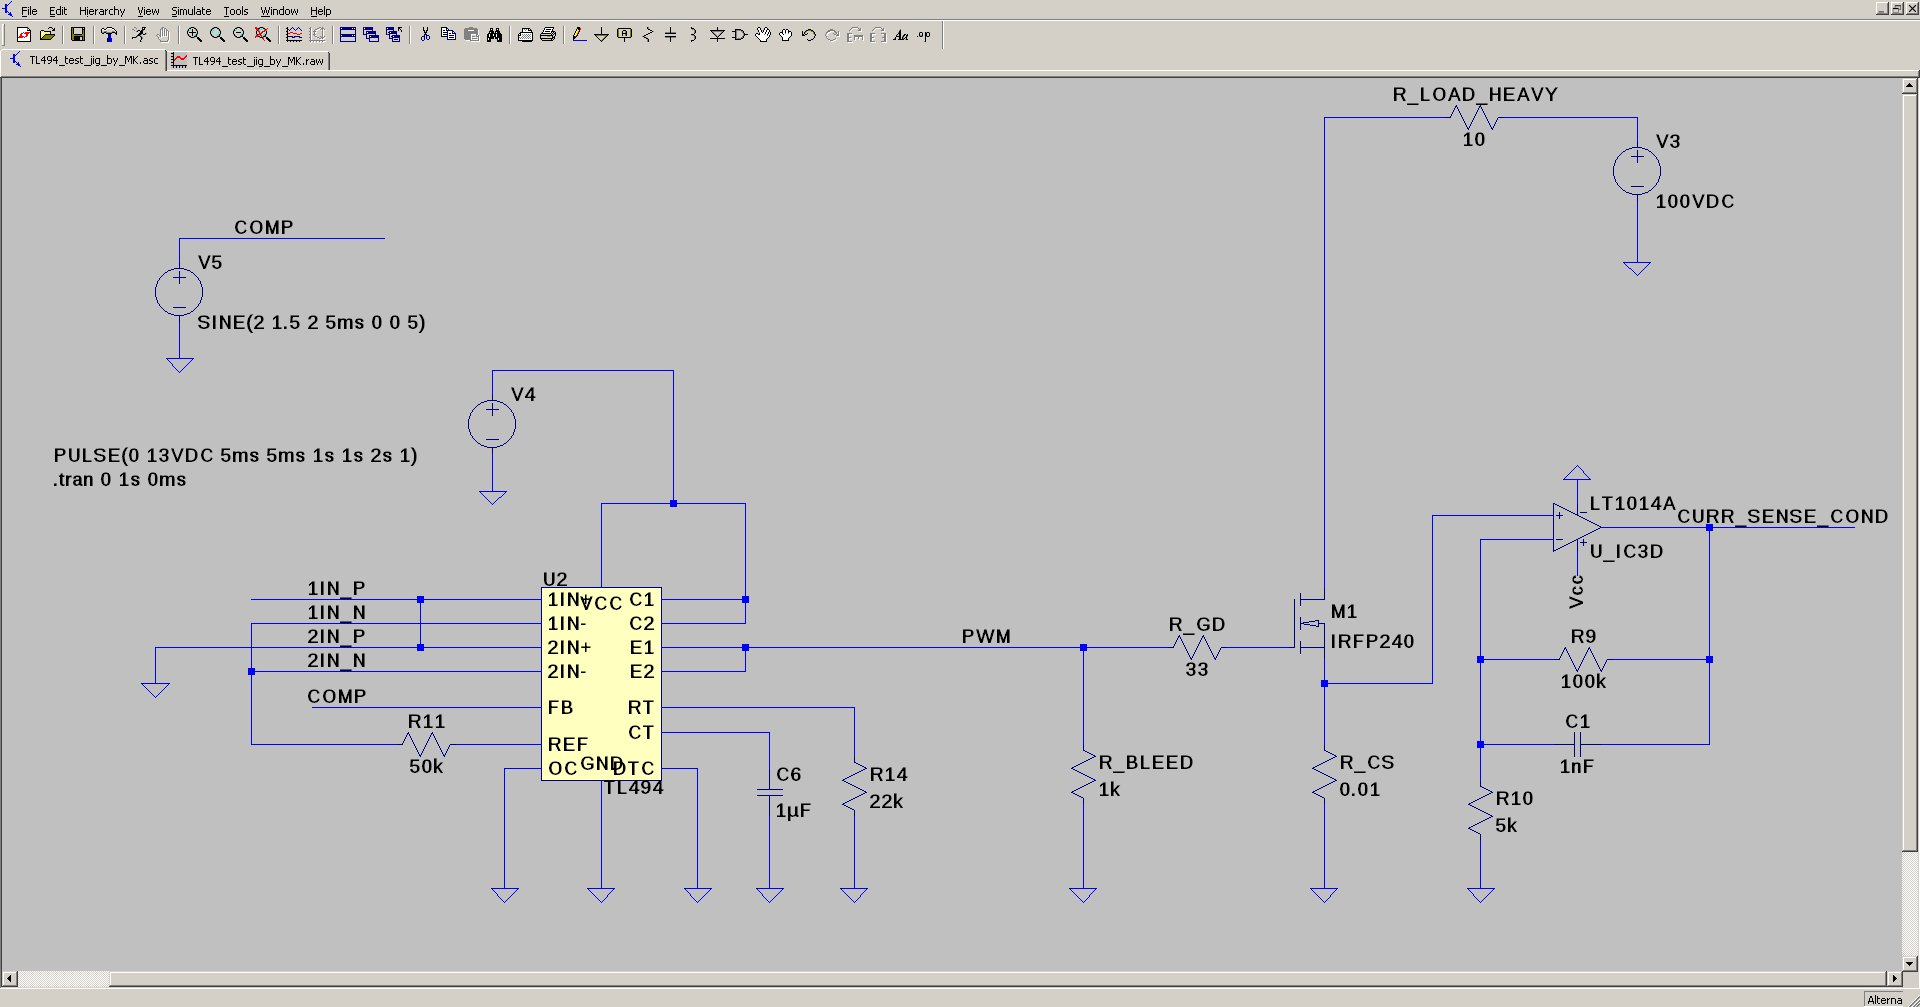 MK Dynamics - Electronics - Power Electronics